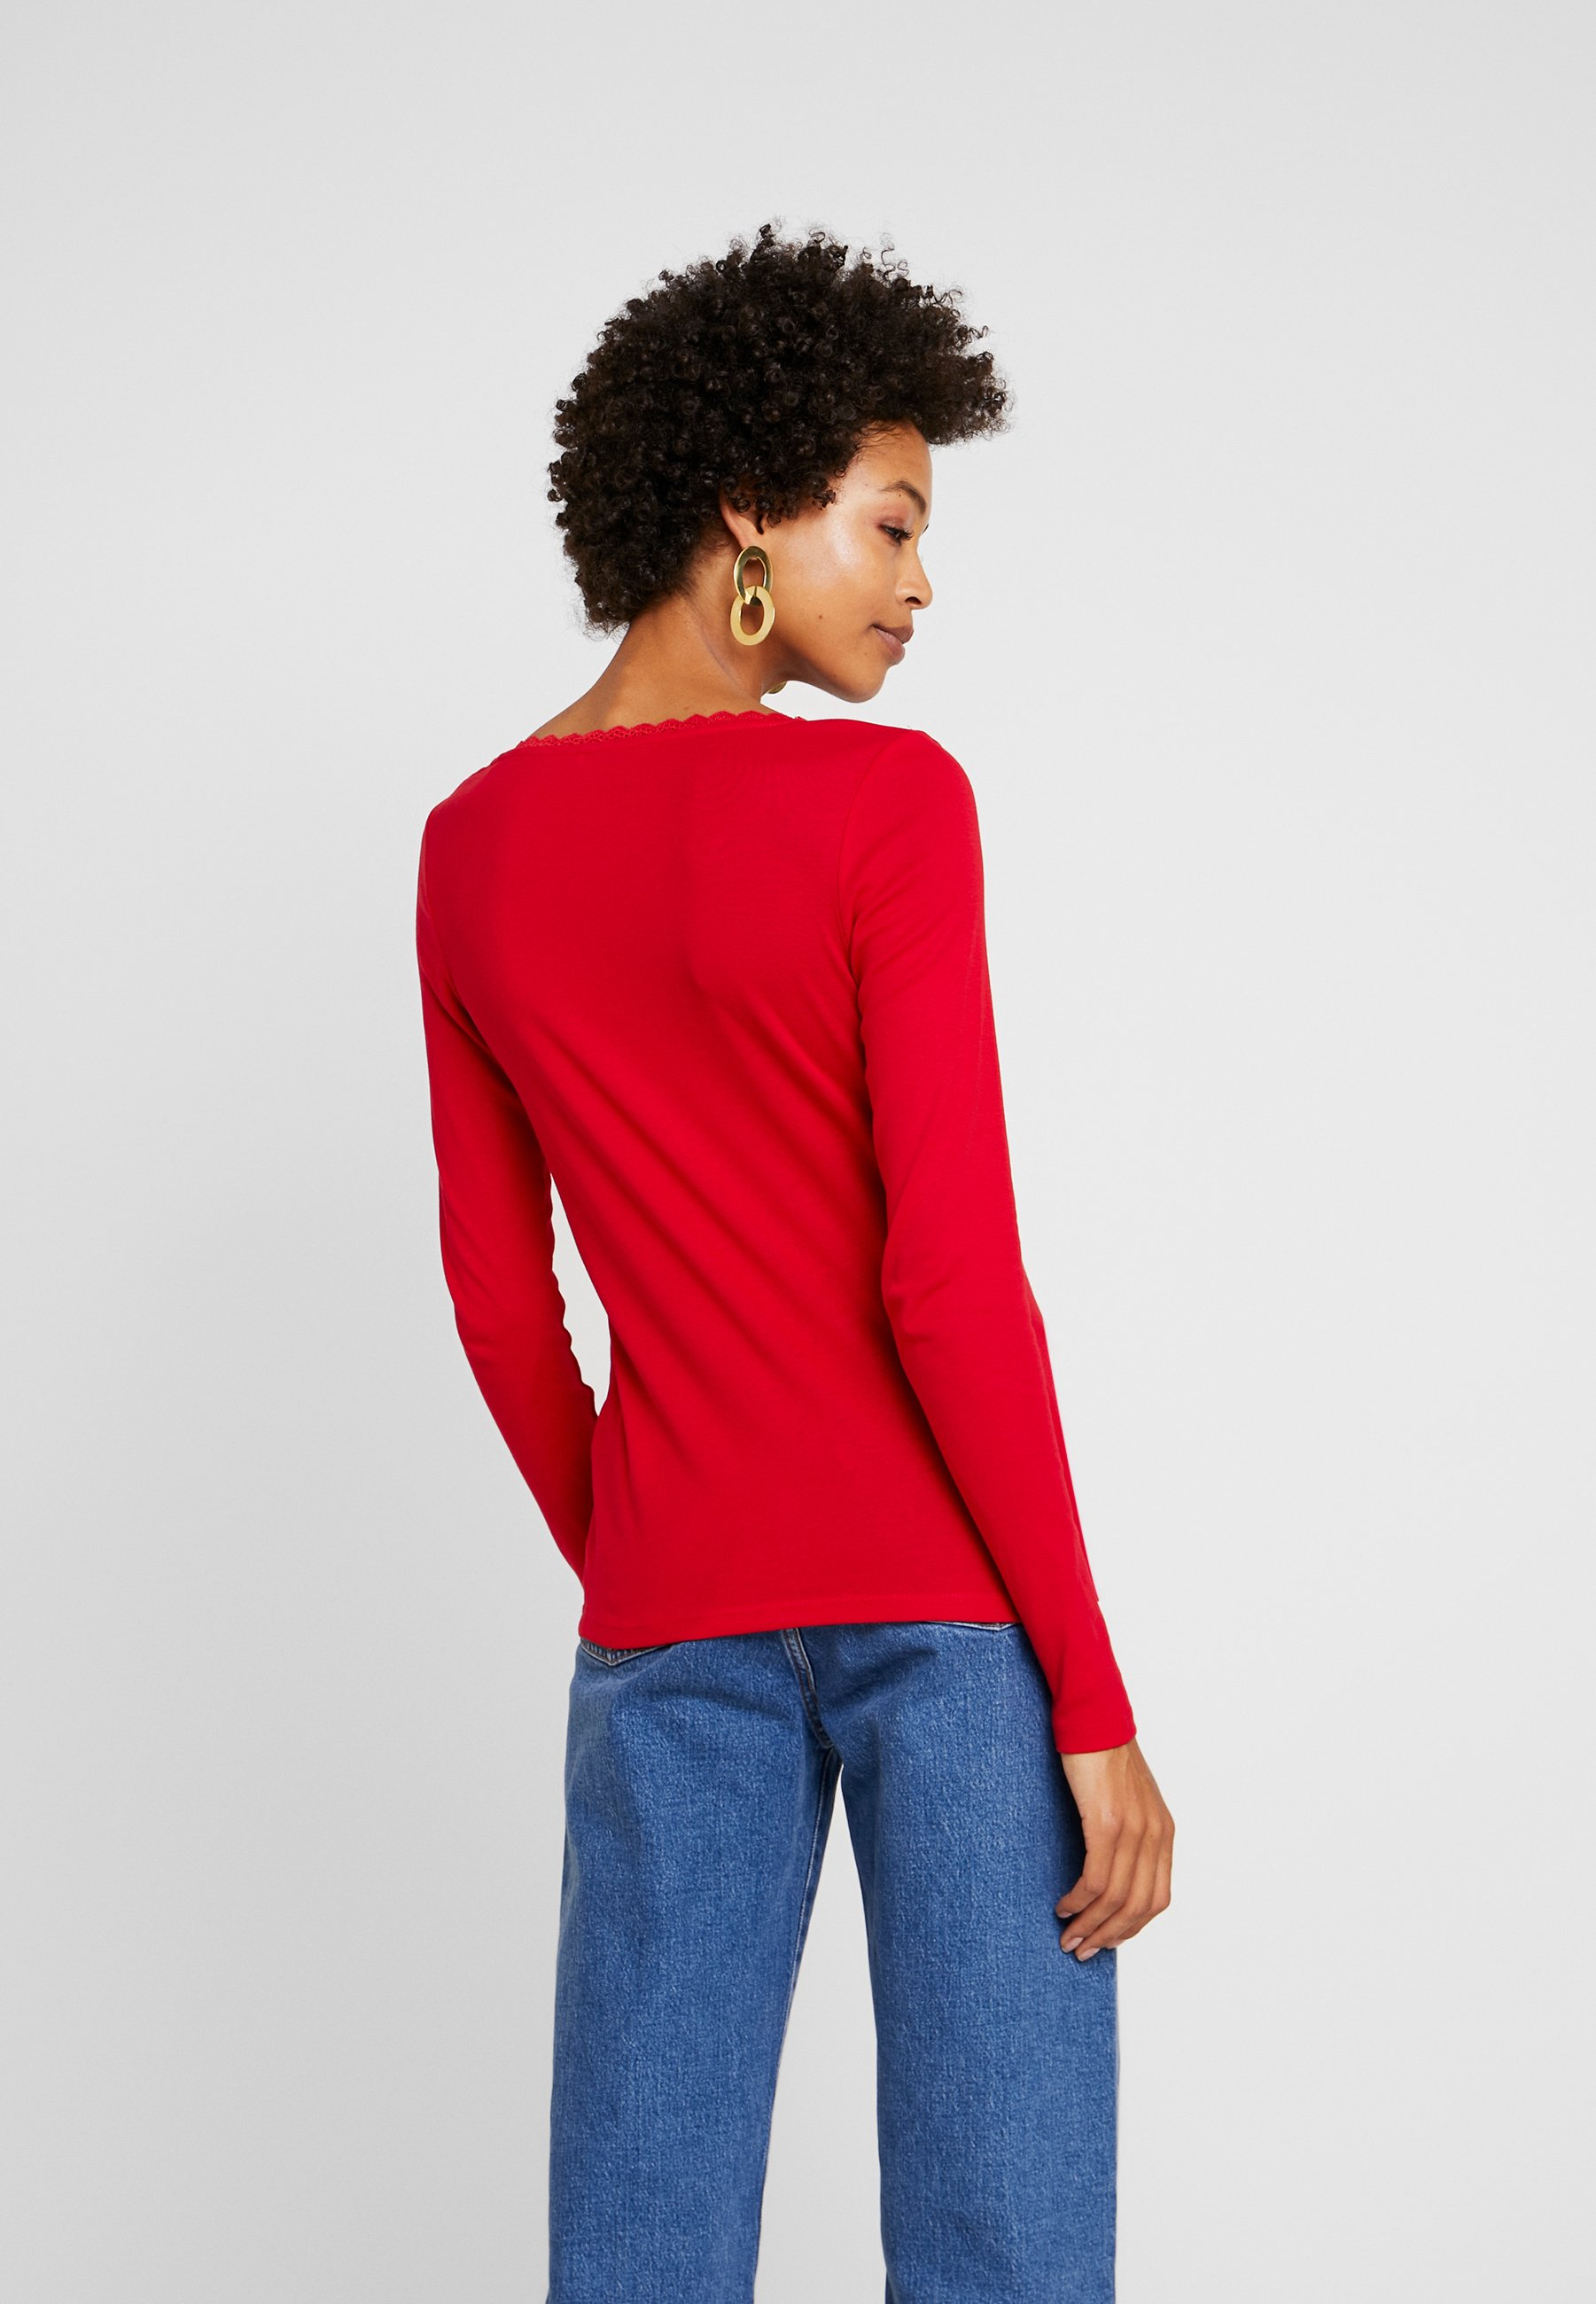 FLOWT Esprit shirt manches red edc longues by CORE à WDIEH29